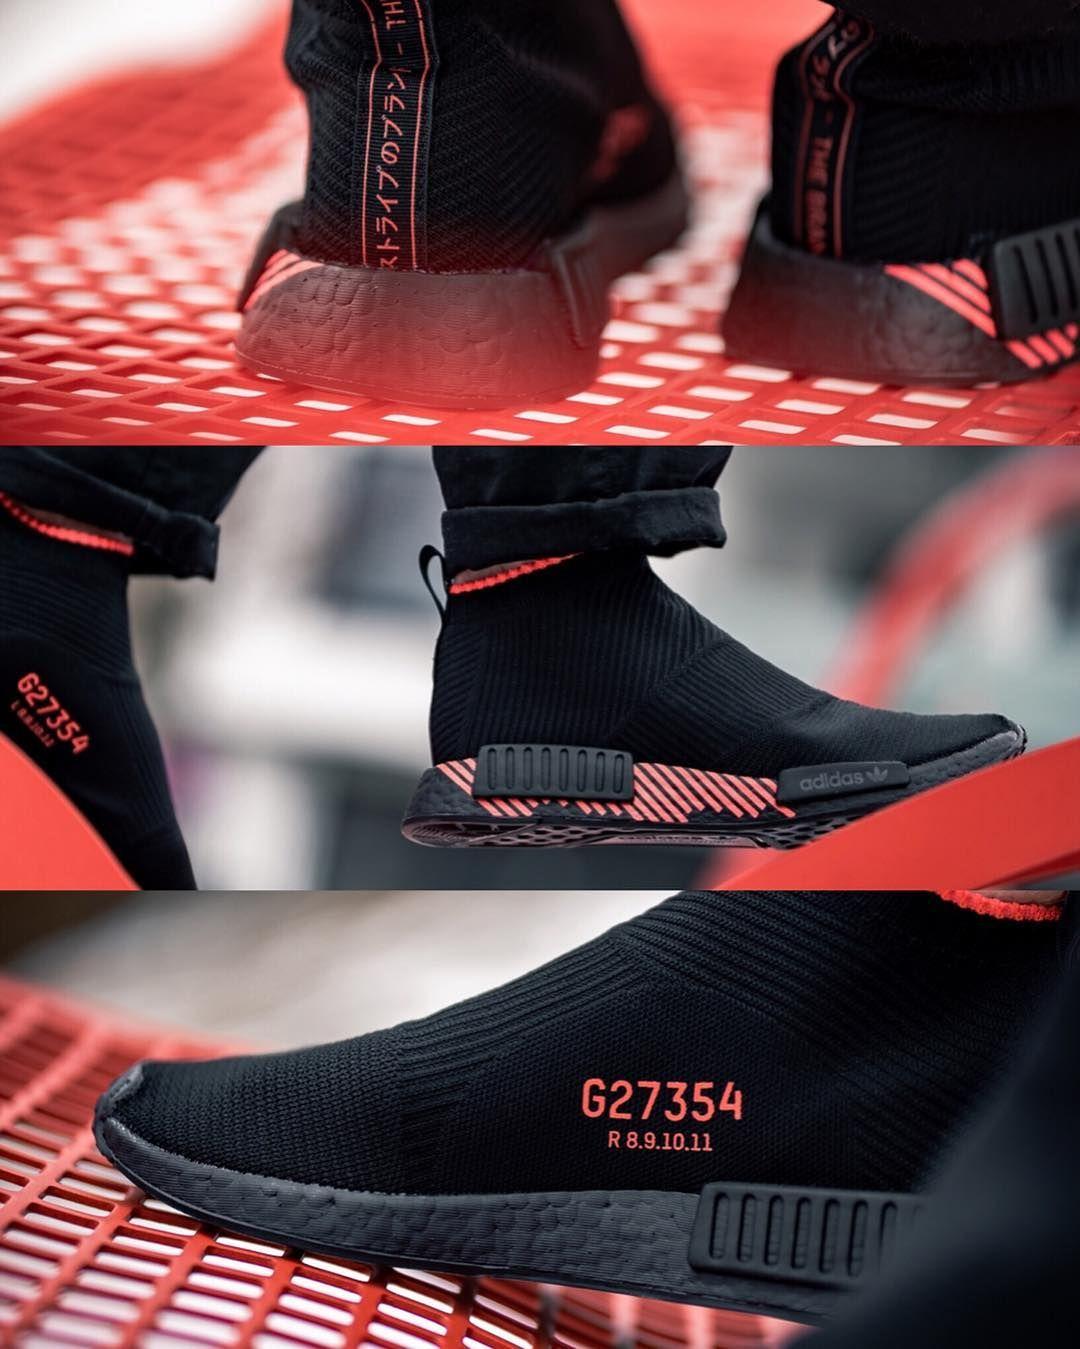 adidas NMD CS1 PK Shock Red📸 43einhalb